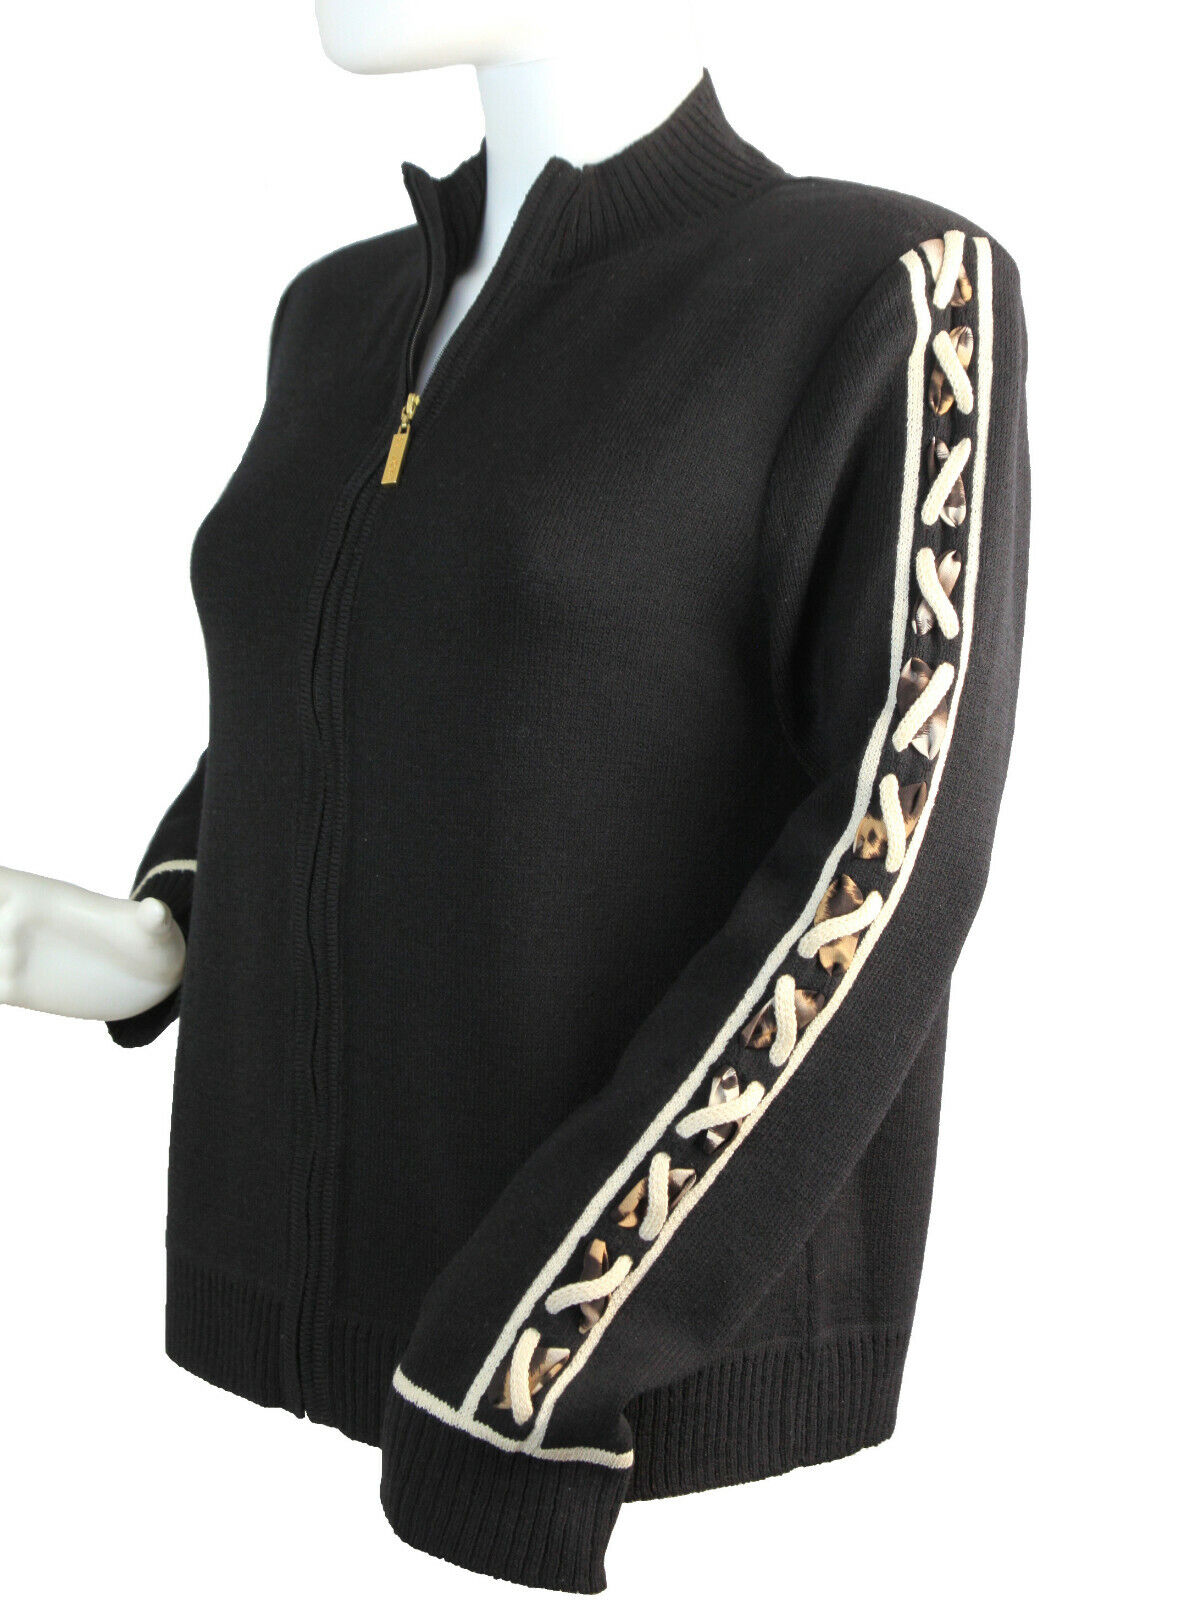 St. John schwarz Wool Blend Knit Zip Cardigan Top With Braided Sleeves Größe Small